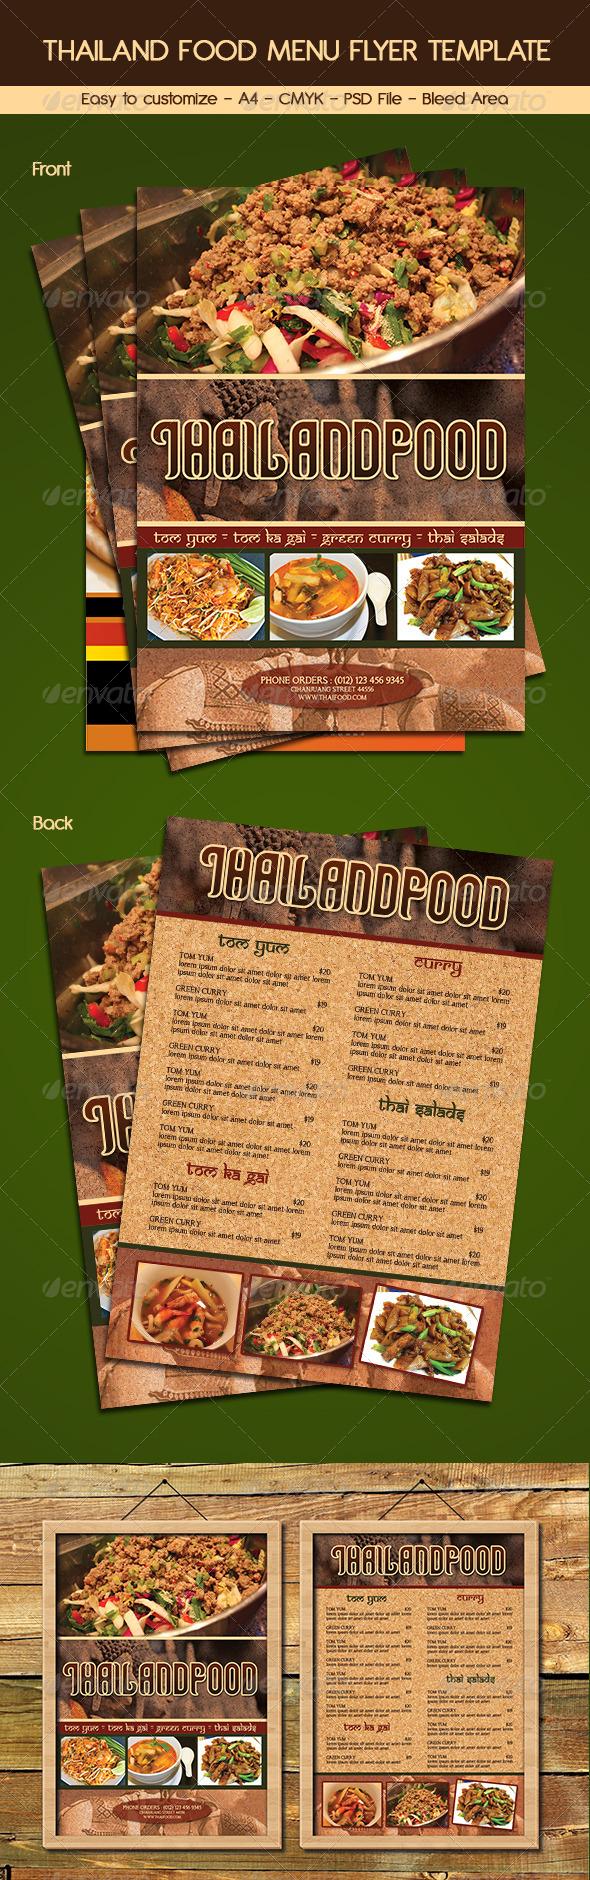 Thailand Food Menu Flyer Template - Food Menus Print Templates